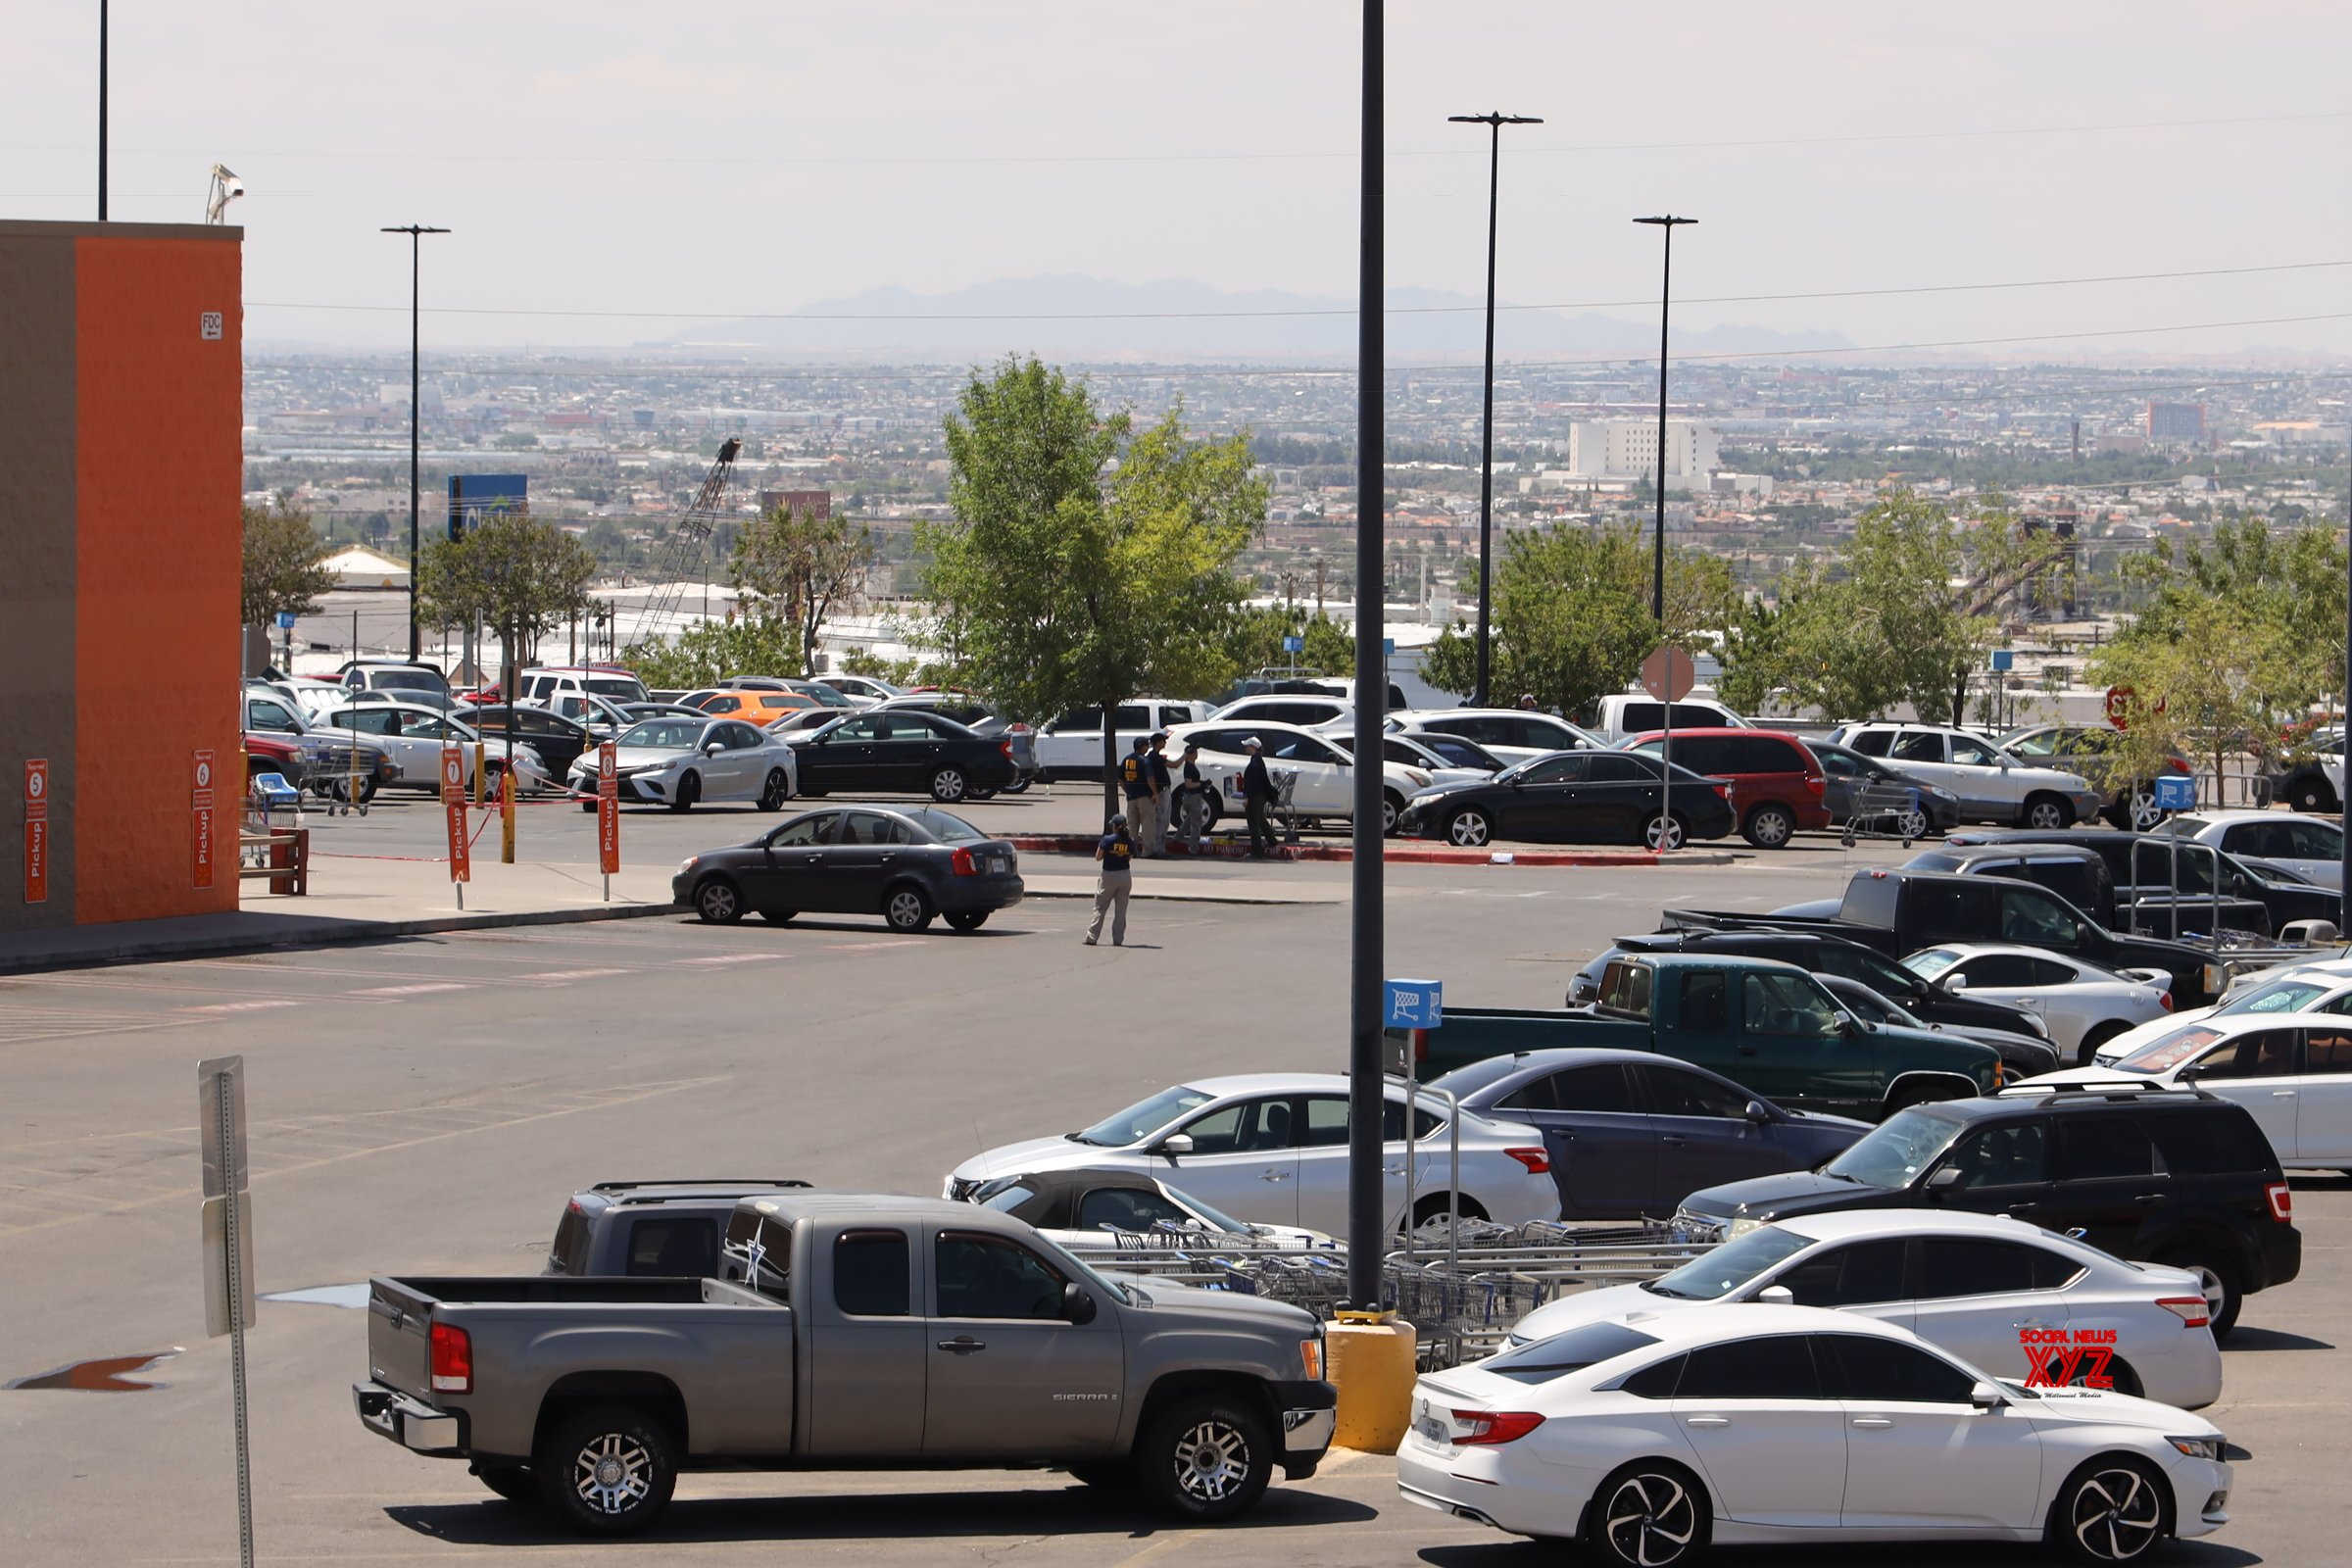 Texas border city imposes curfew